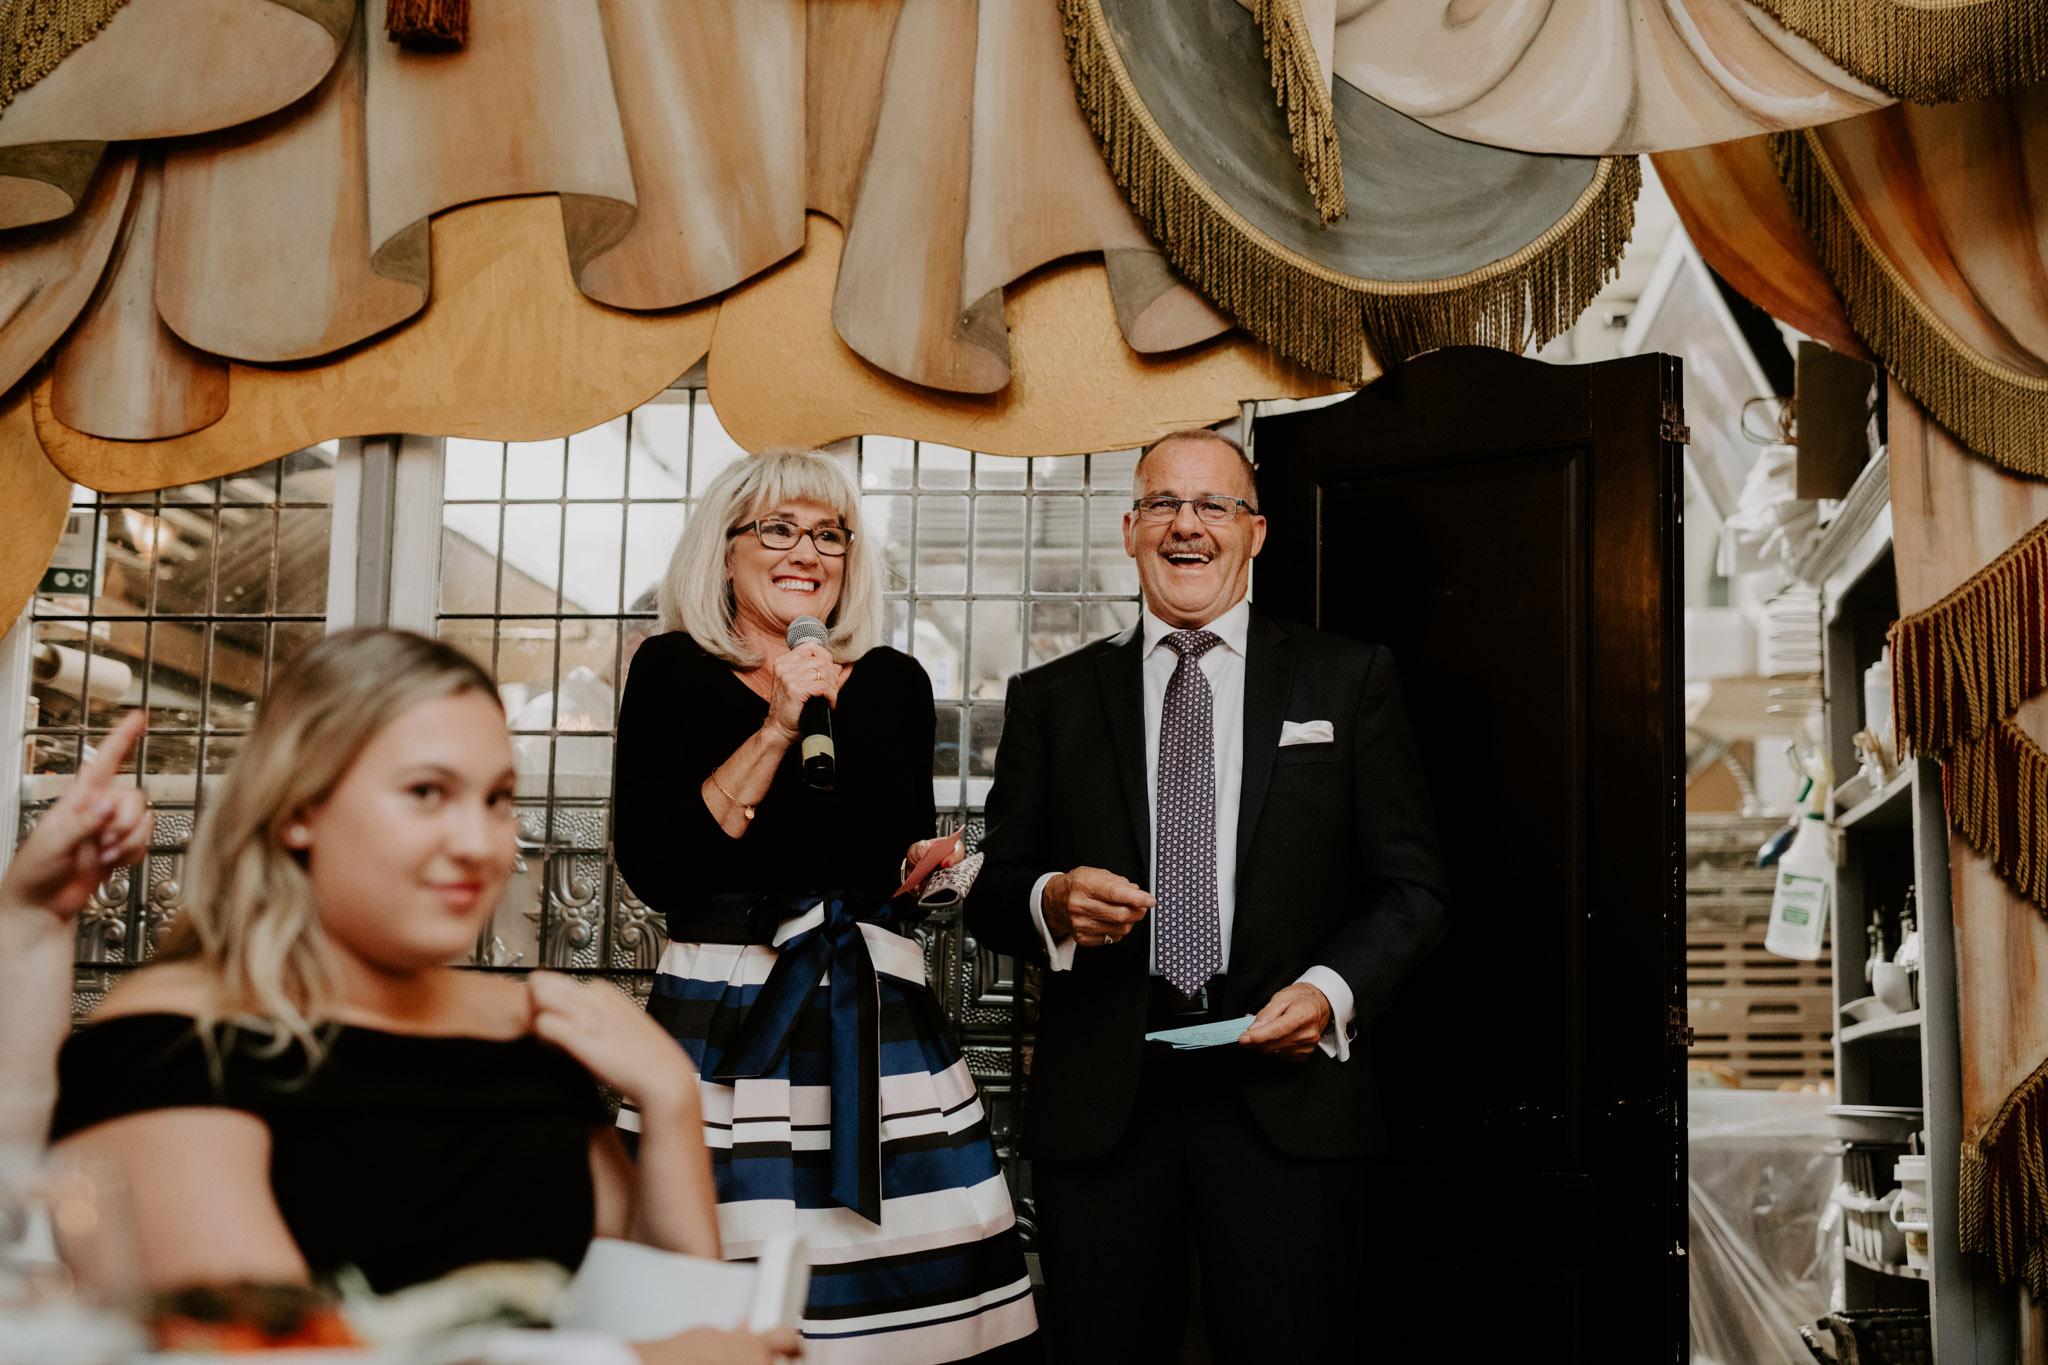 Liberty Village Wedding - parents speech